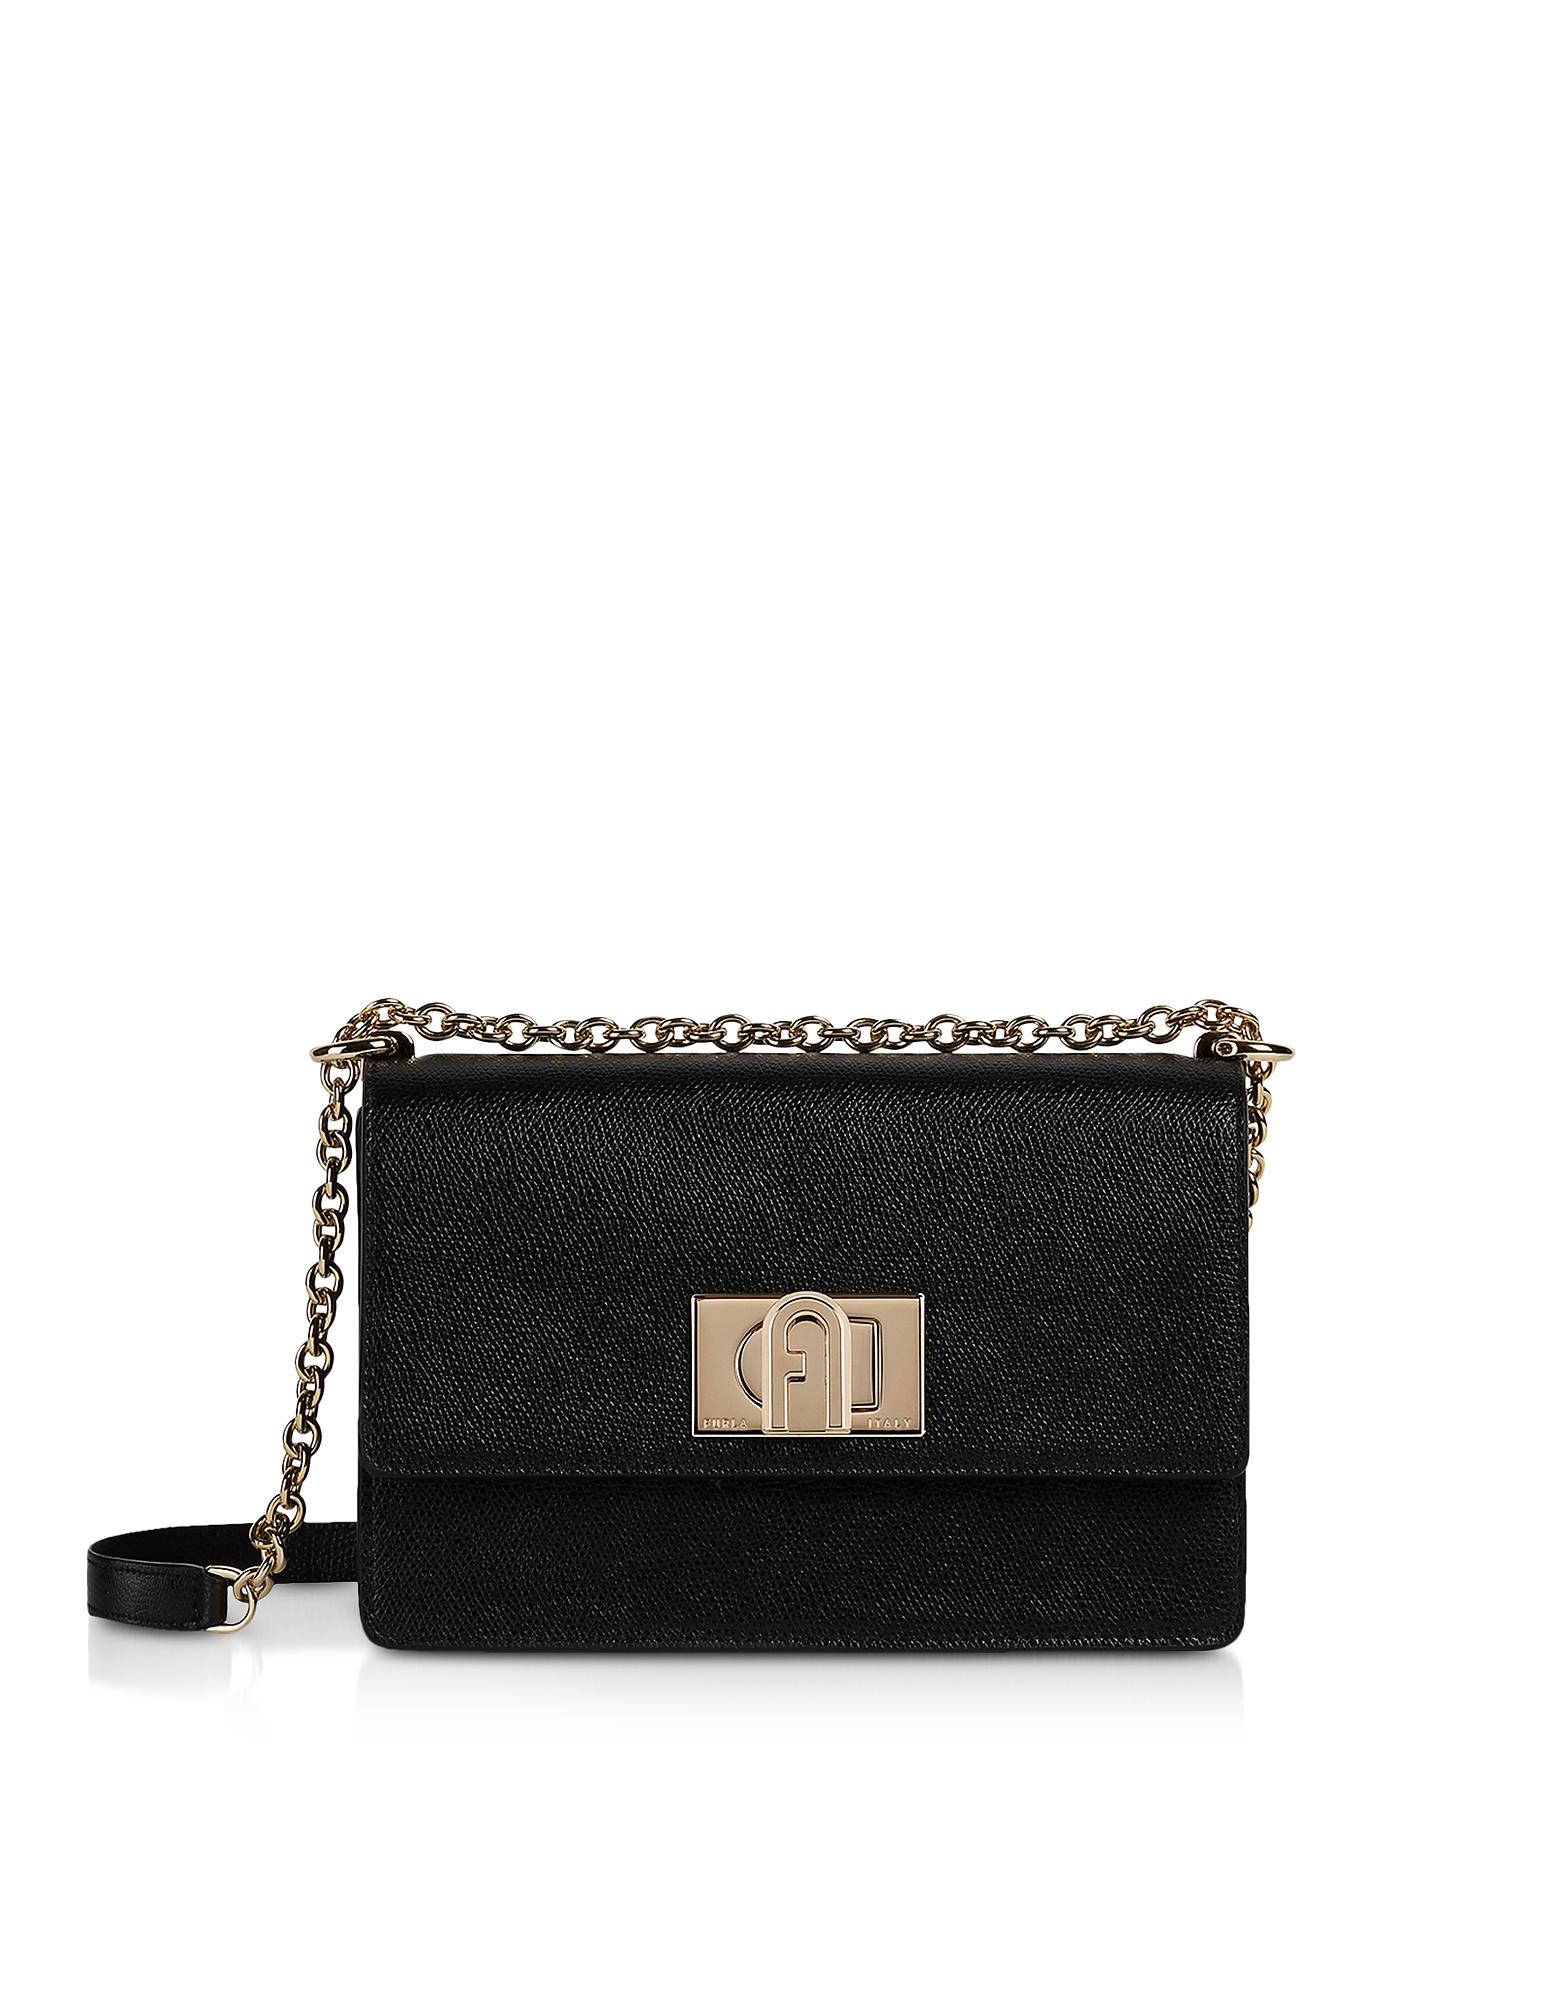 Furla Designer Handbags, 1927 Mini Crossbody Bag 20